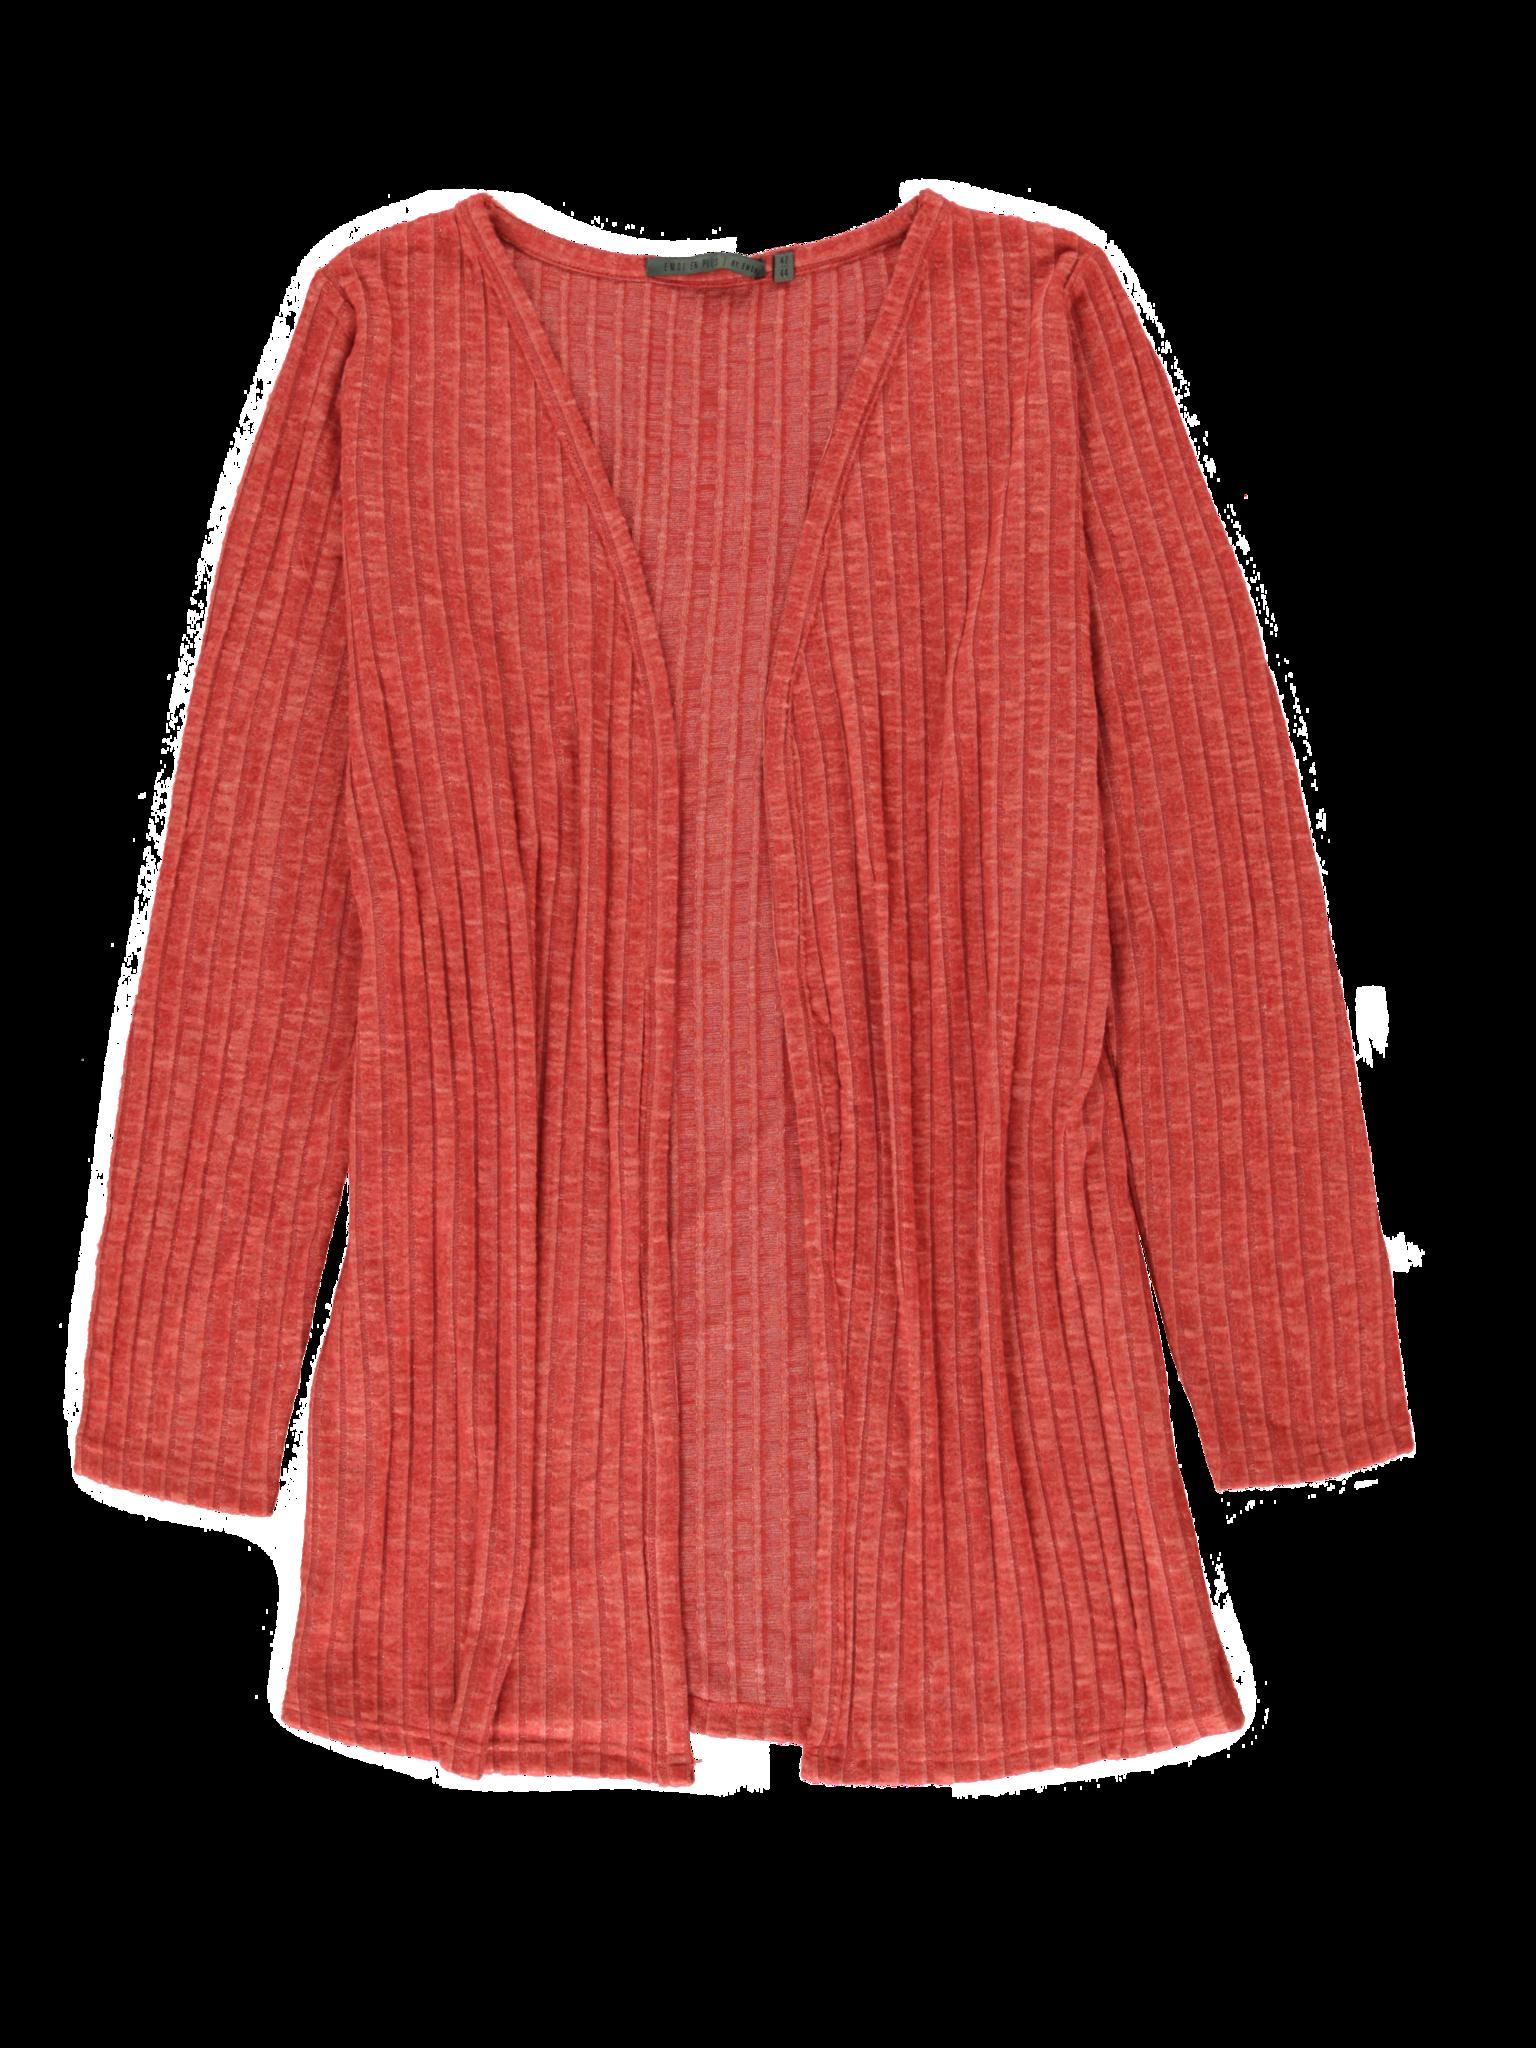 All Brands | Winterproducts Ladies+ | Cardigan Sweater | 24 pcs/box